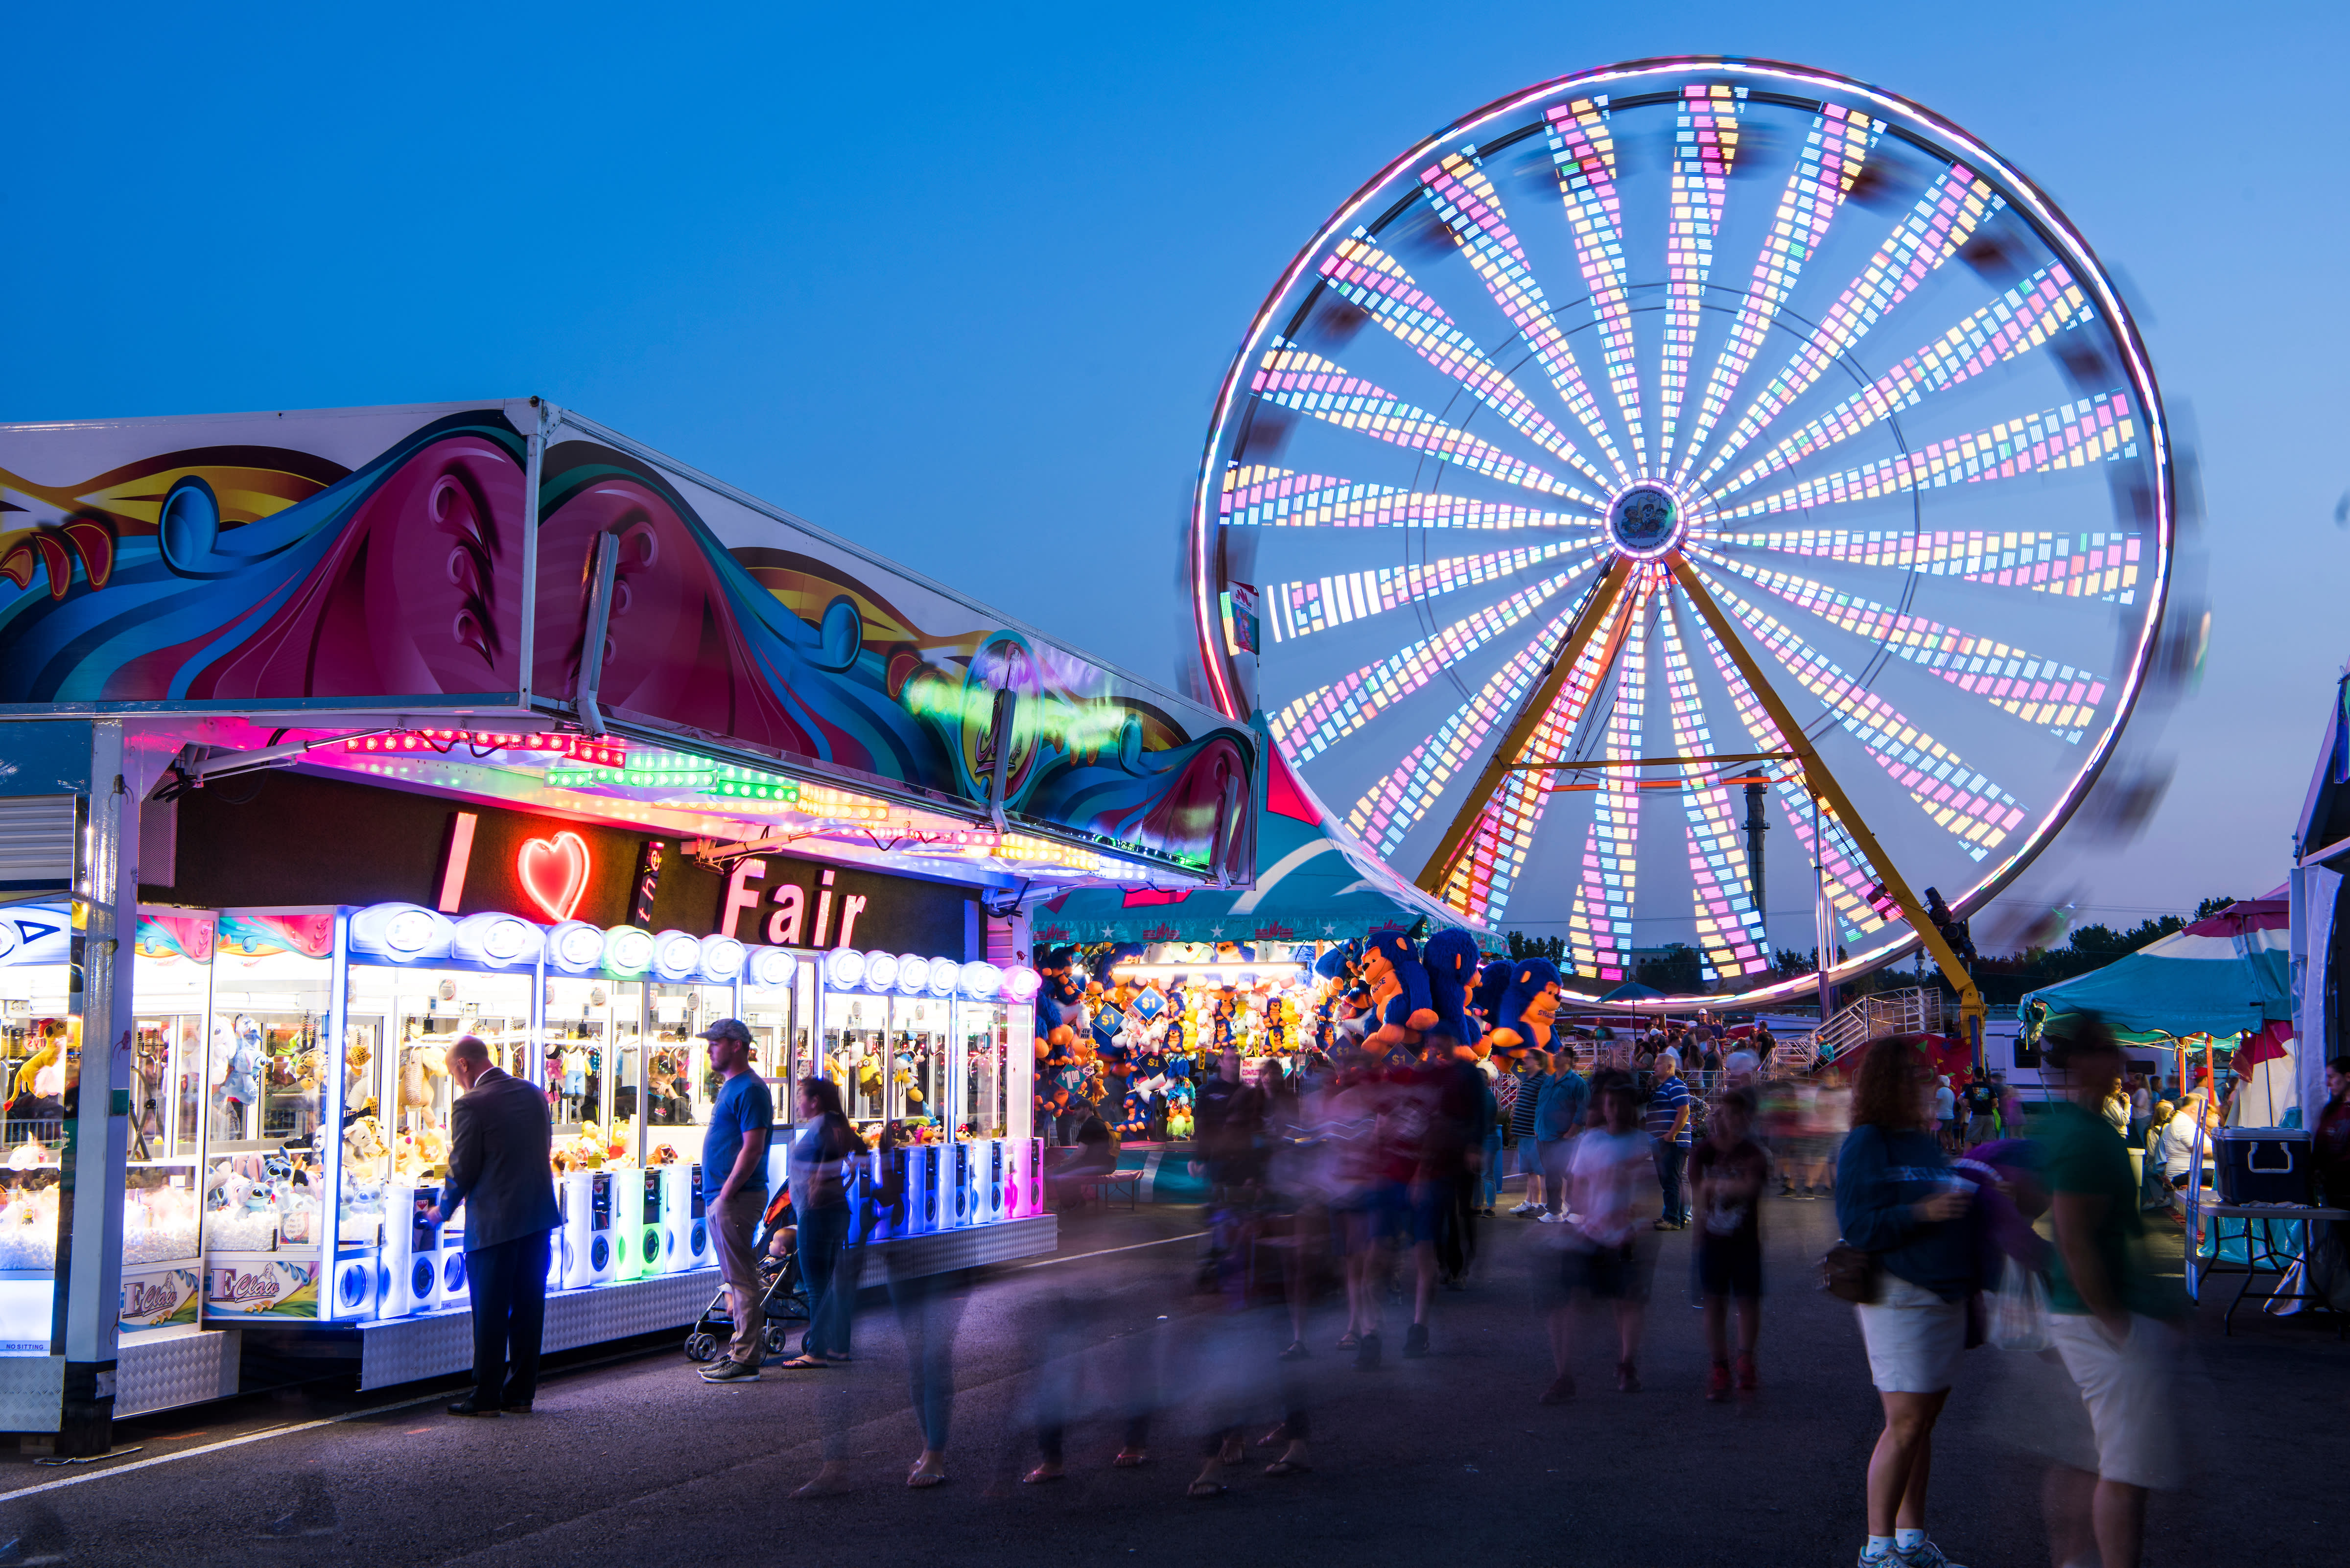 New York State Fair 2019 Great New York State Fair | Syracuse, NY 13209